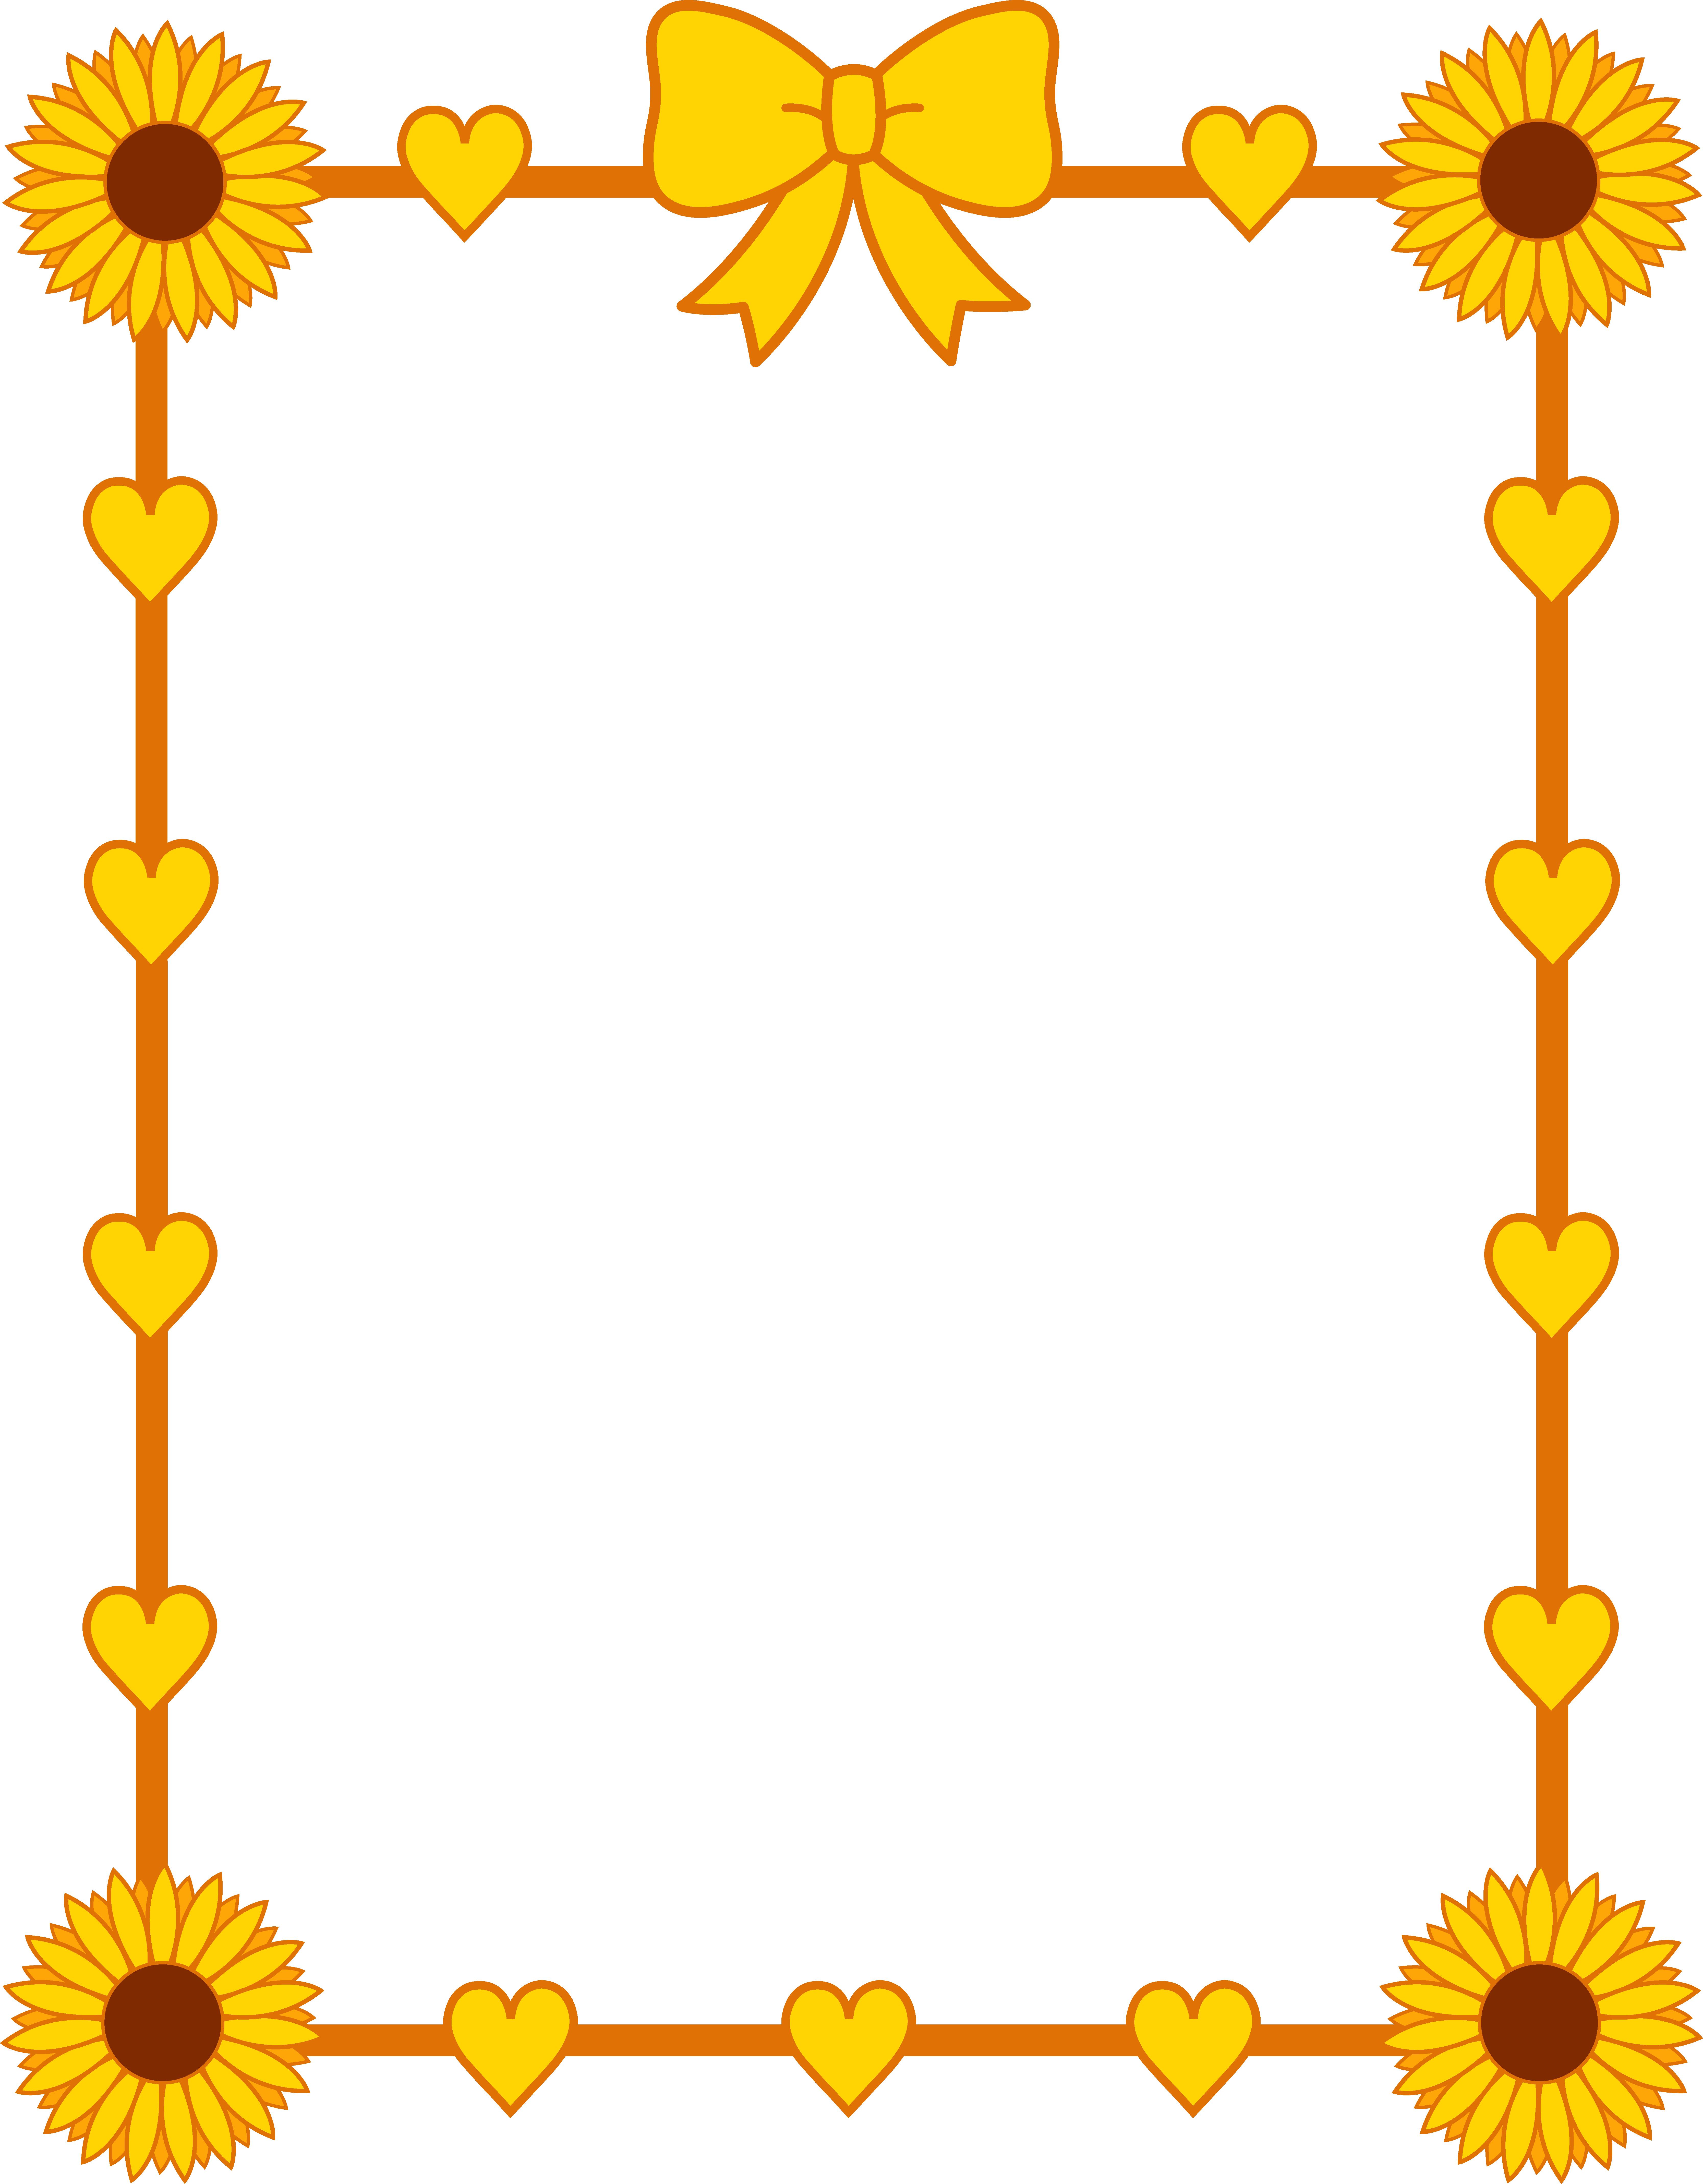 Download Yellow Border Frame Photo HQ PNG Image   FreePNGImg